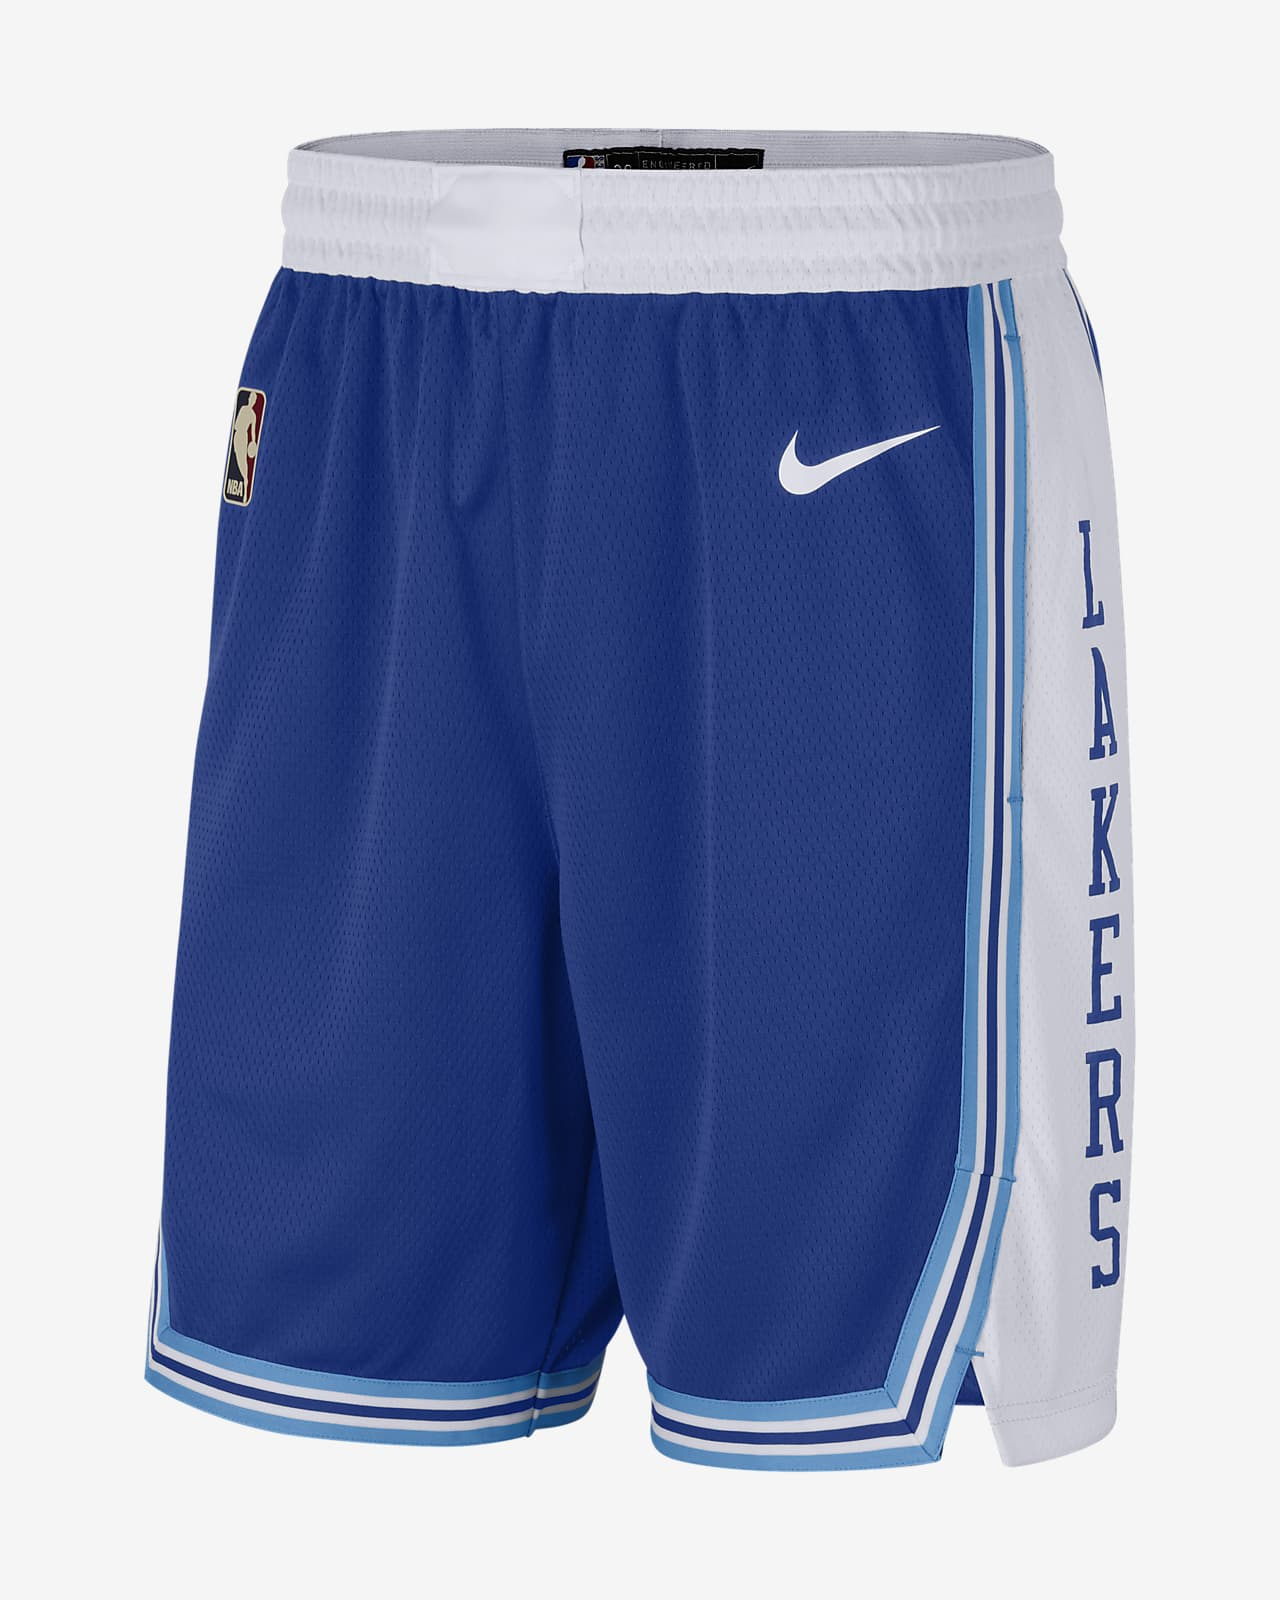 2020 赛季洛杉矶湖人队 Classic Edition Nike NBA Swingman 男子短裤